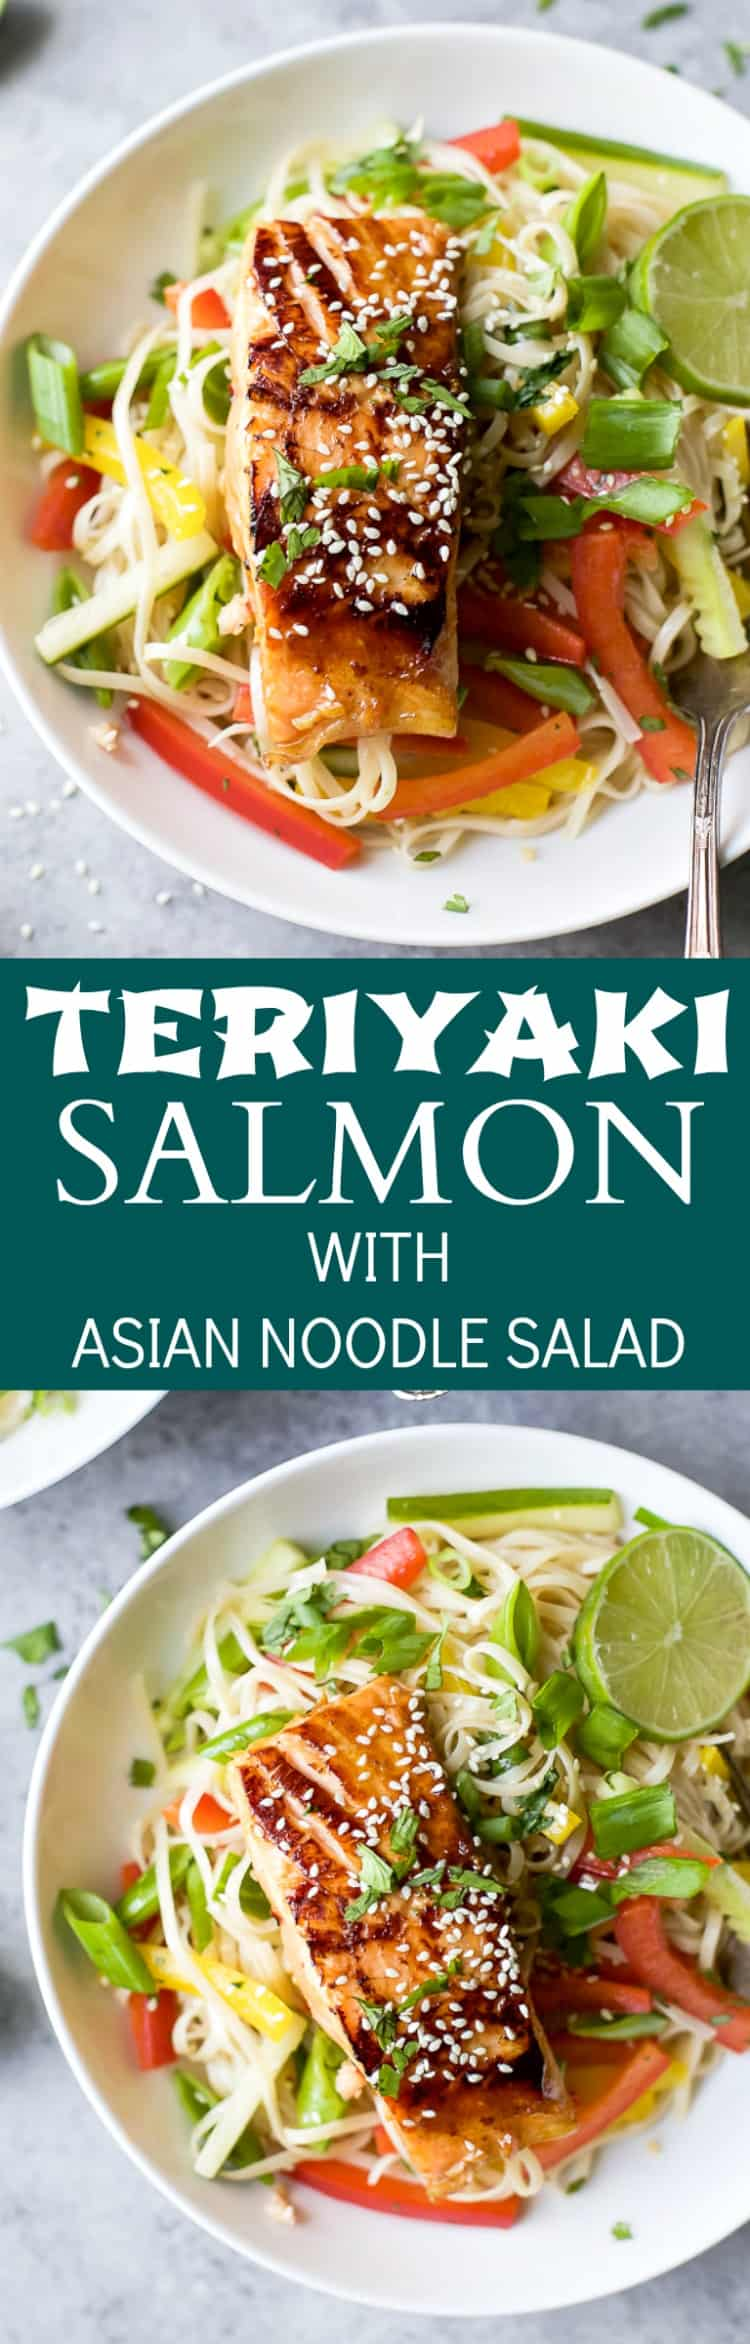 Teriyaki Salmon With Asian Noodle Salad Easy Healthy Recipes